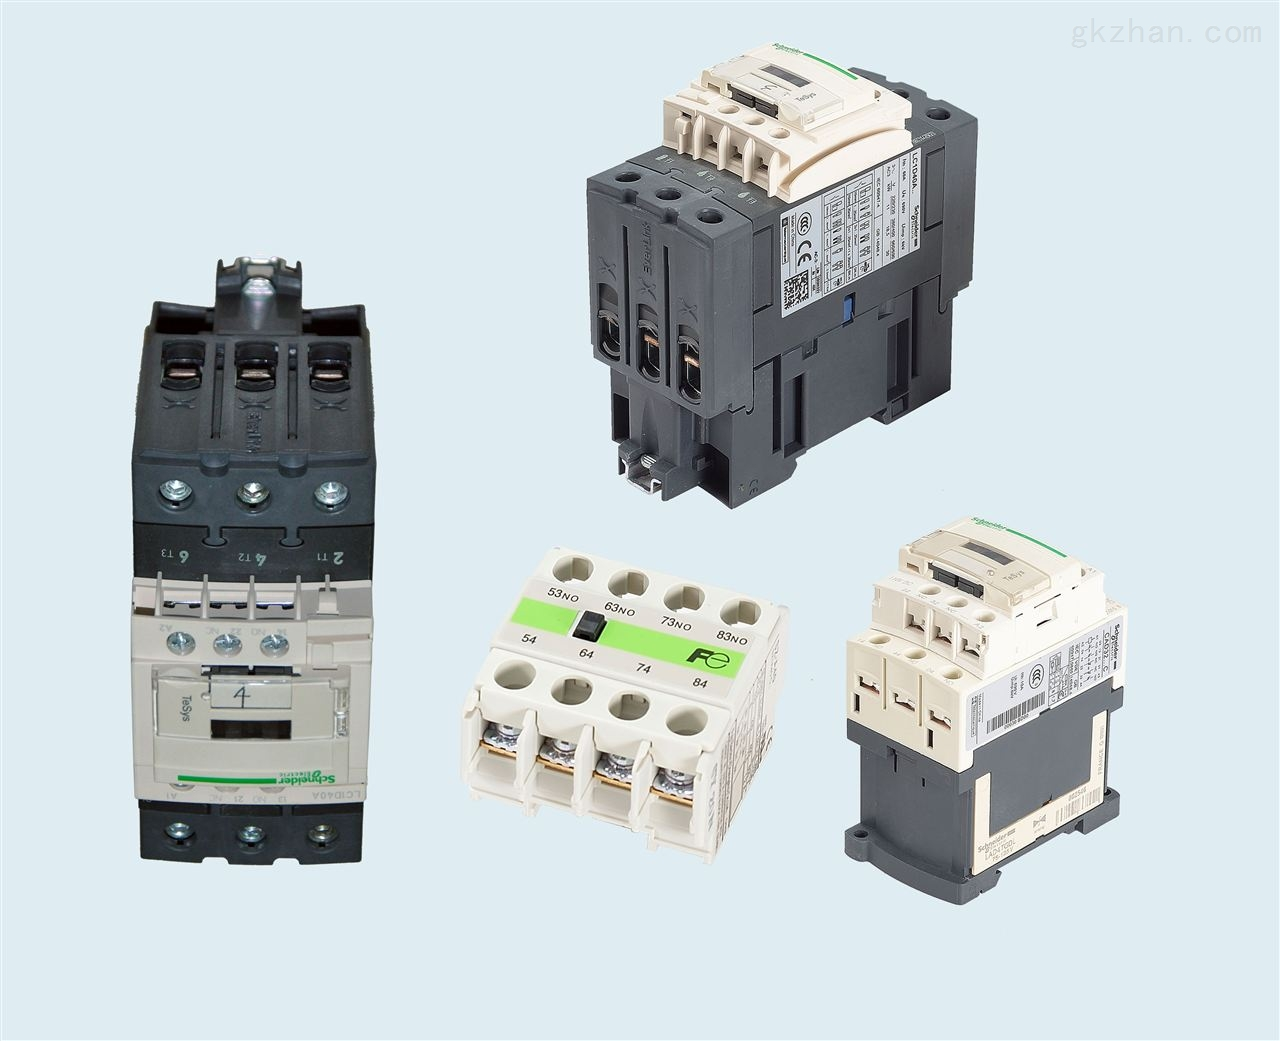 lc 1d40f7c 原装正品施耐德直流接触器 电梯专用lc1d126fl